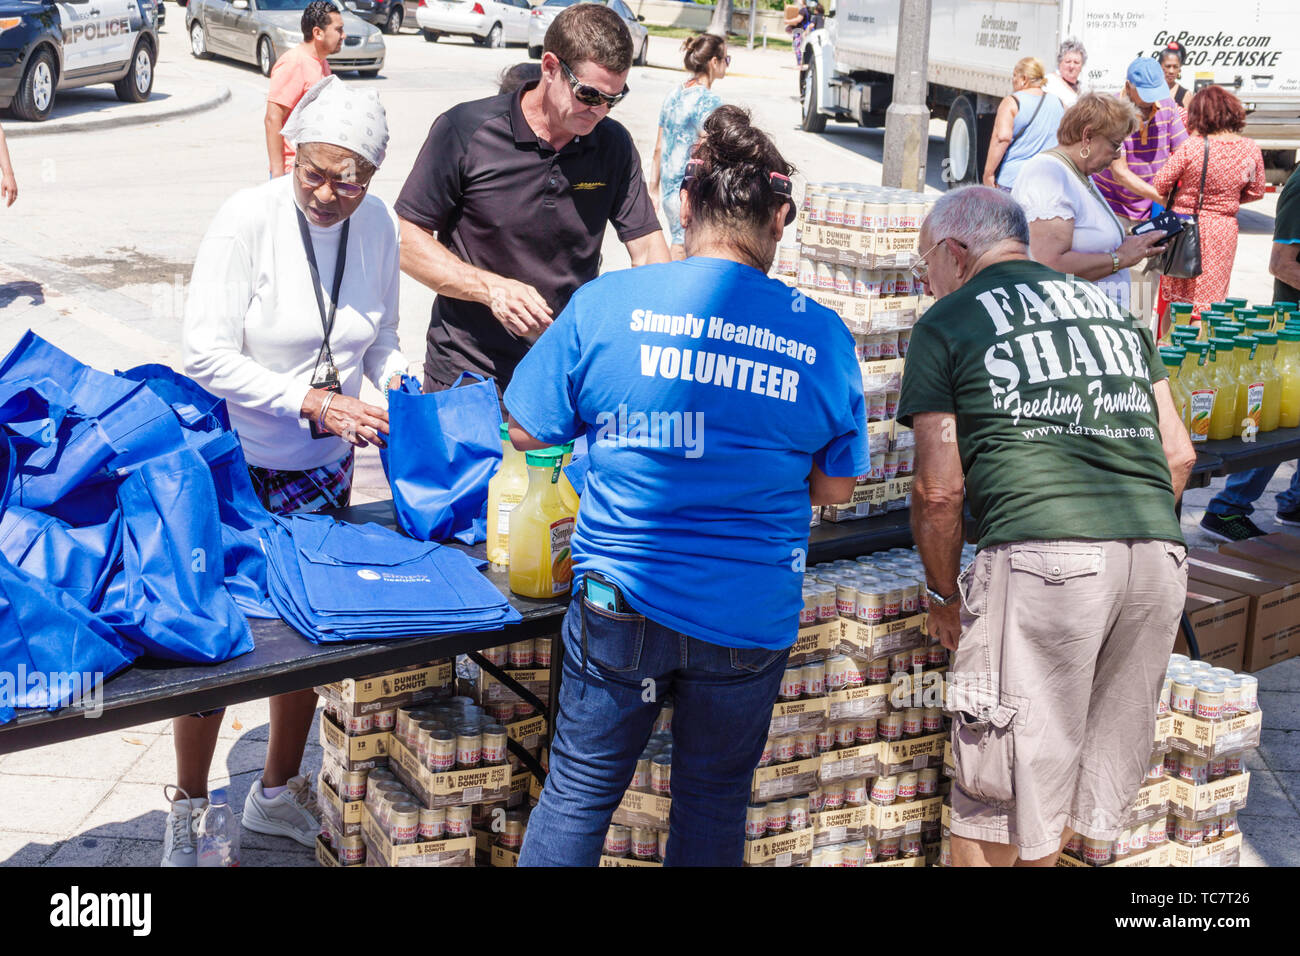 Miami Beach, Florida, North Beach Ocean Terrace Farm compartir alimentos de distribución LIBRE giveaway necesitados de bajos ingresos hombre mujer voluntarios hispanos de raza negra Imagen De Stock